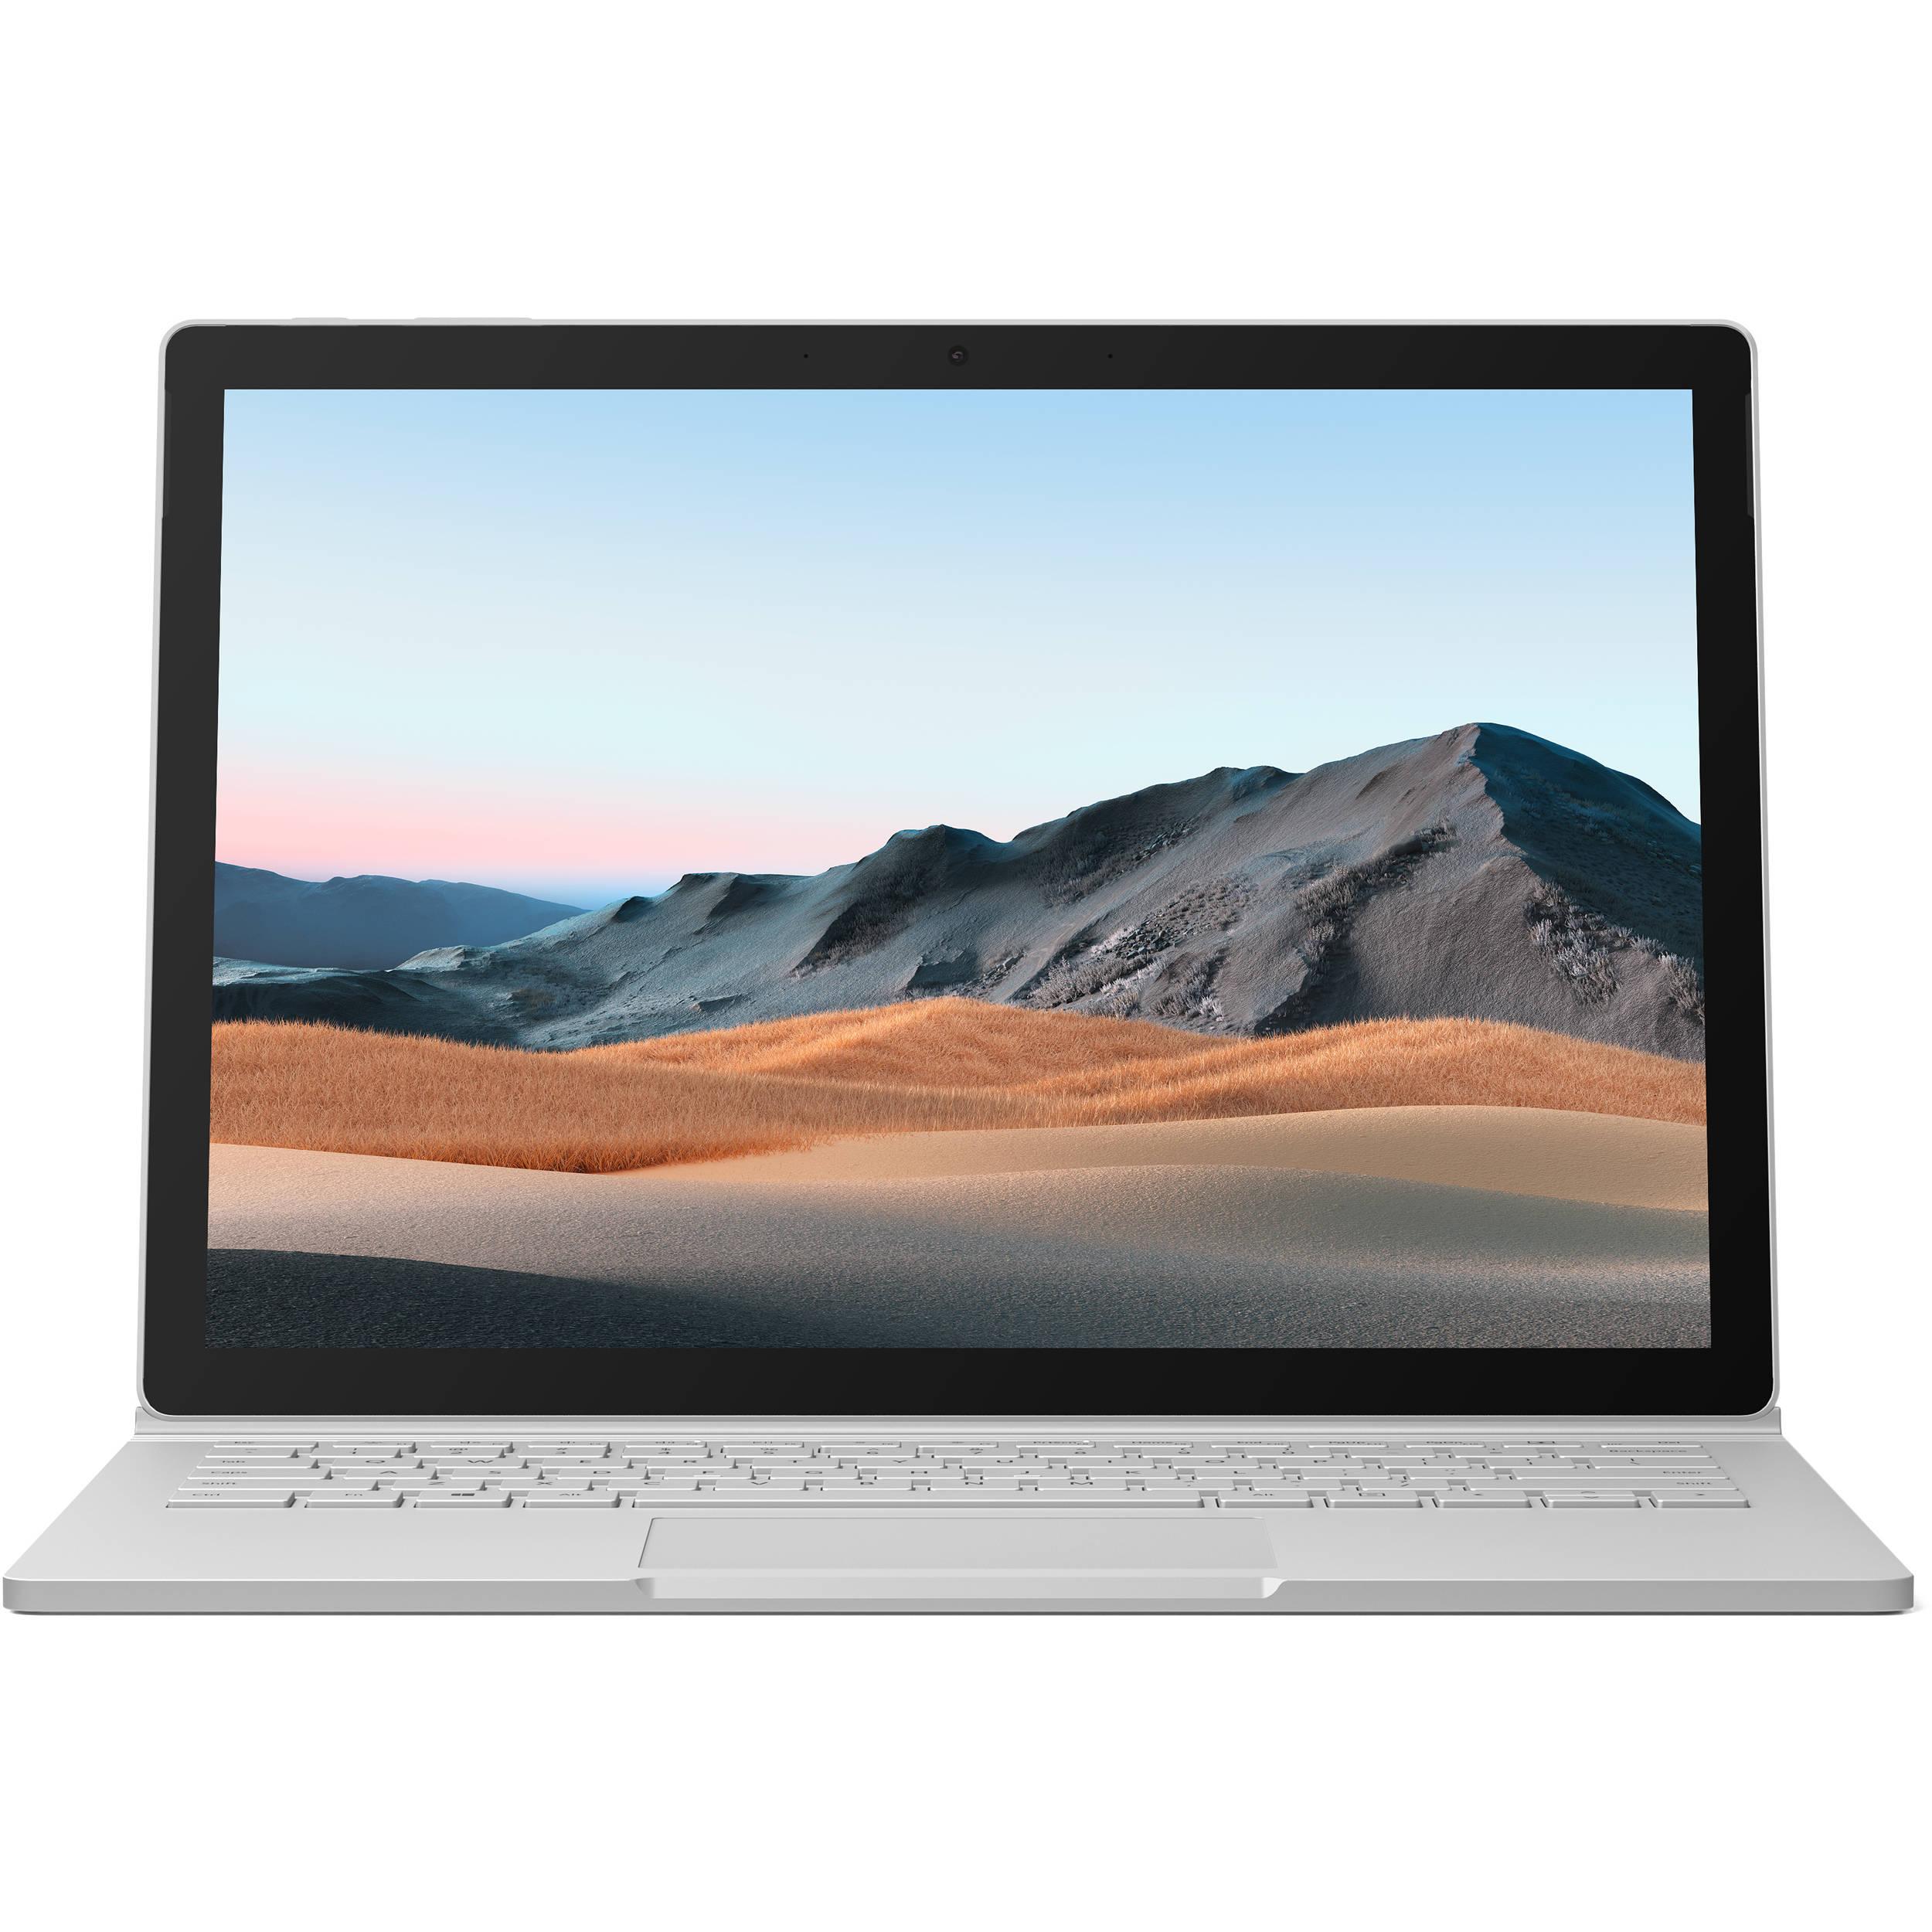 فروش نقدی و اقساطی لپ تاپ 13 اینچی مایکروسافت مدل Surface Book 3- F